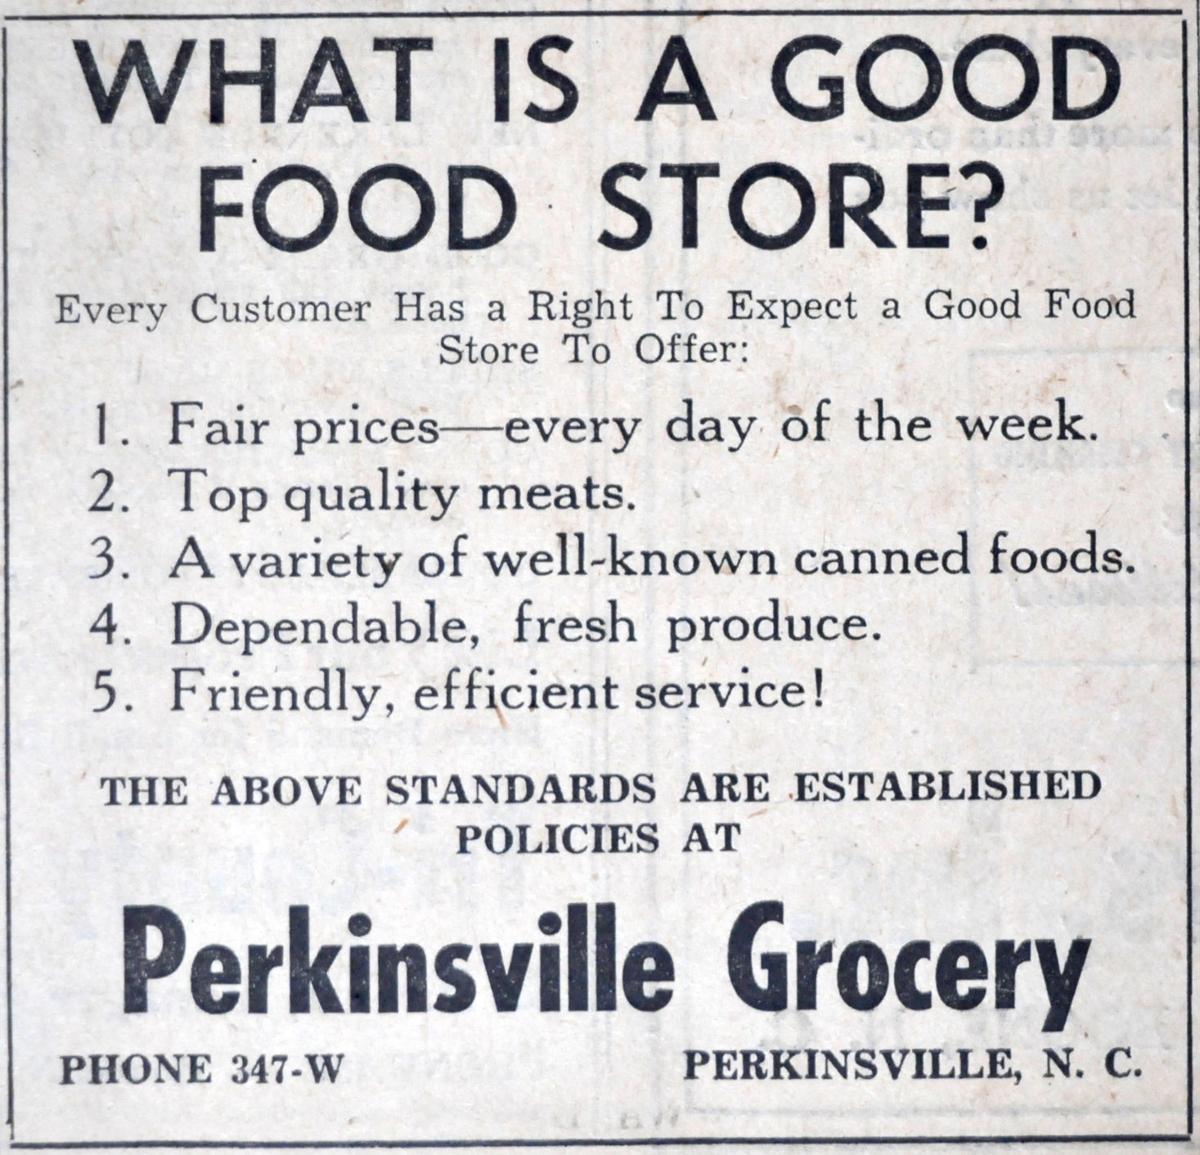 Perkinsville Grocery